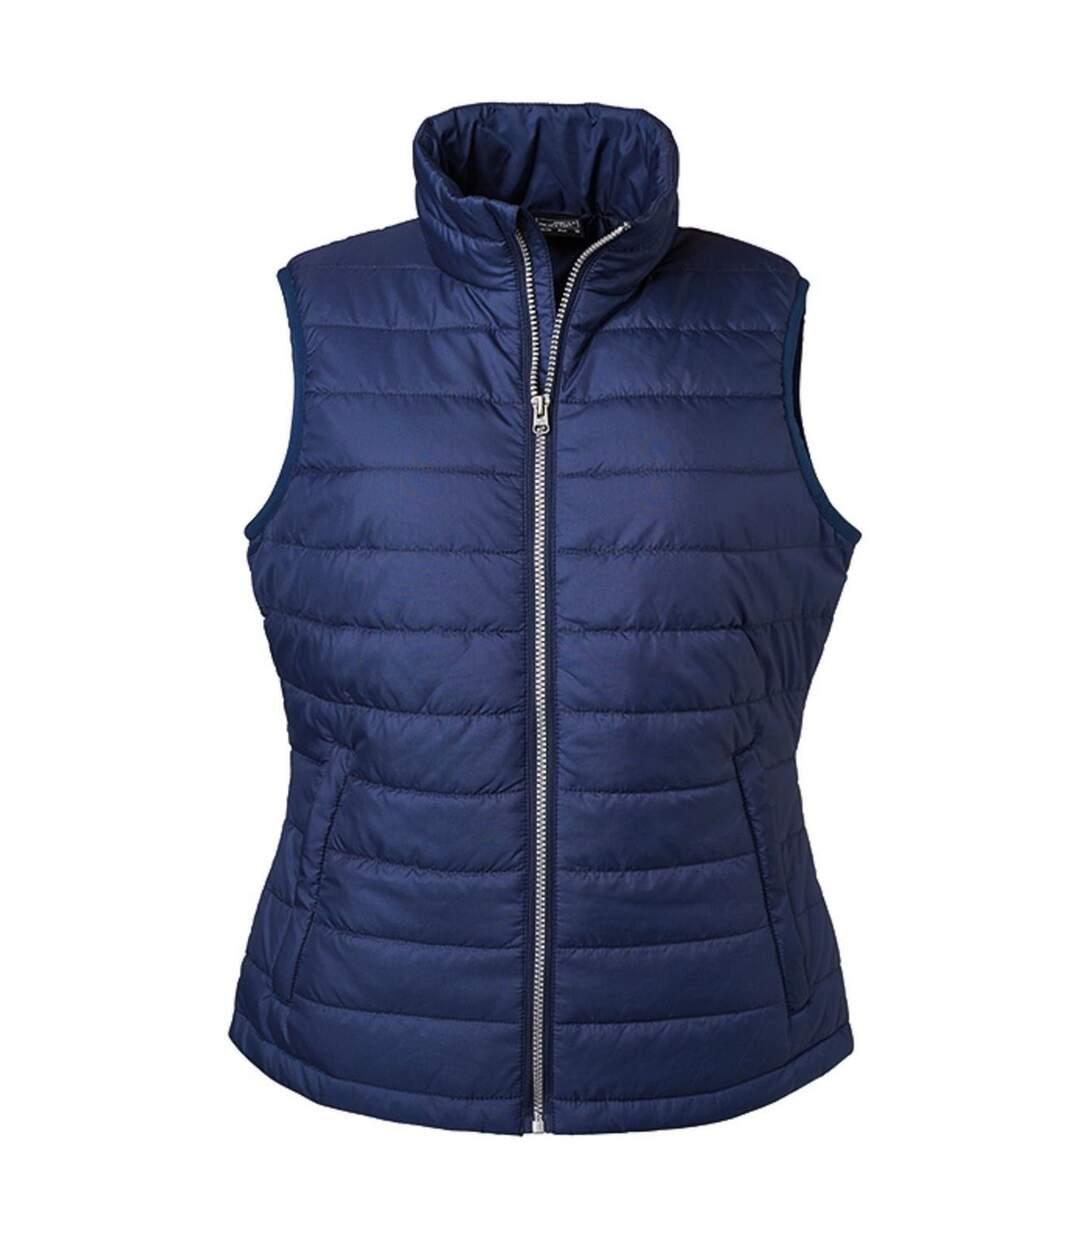 Bodywarmer gilet sans manches - JN1135 - bleu marine - Femme